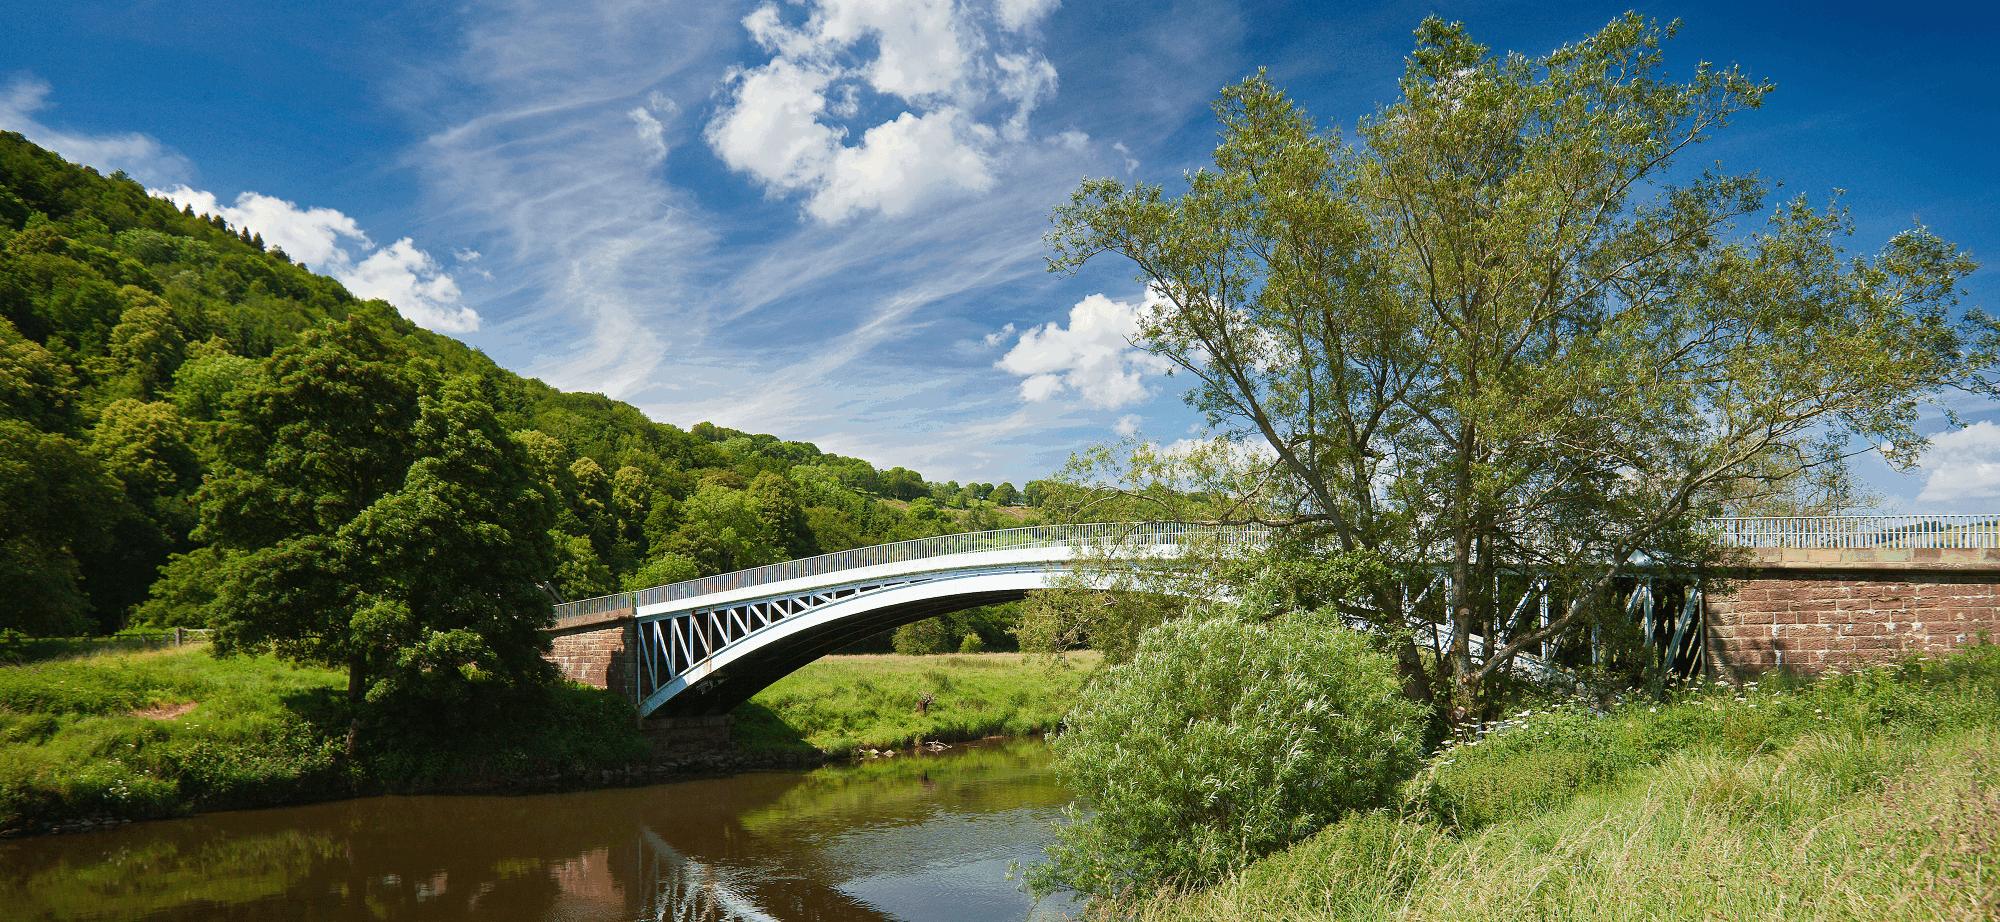 Wye-Valley-Bigsweir-bridge